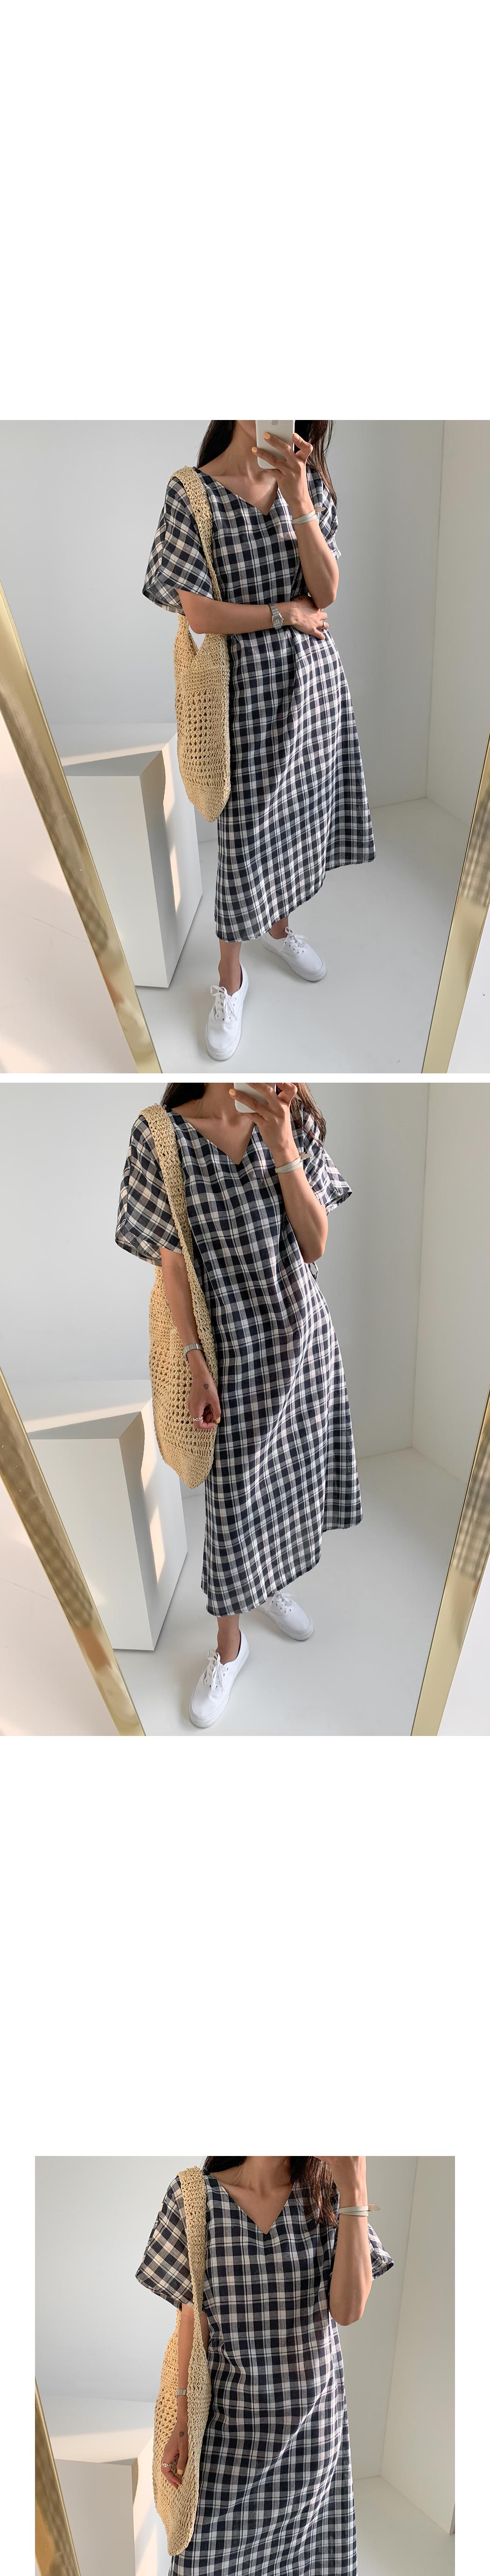 Pine rattan cross shoulder bag